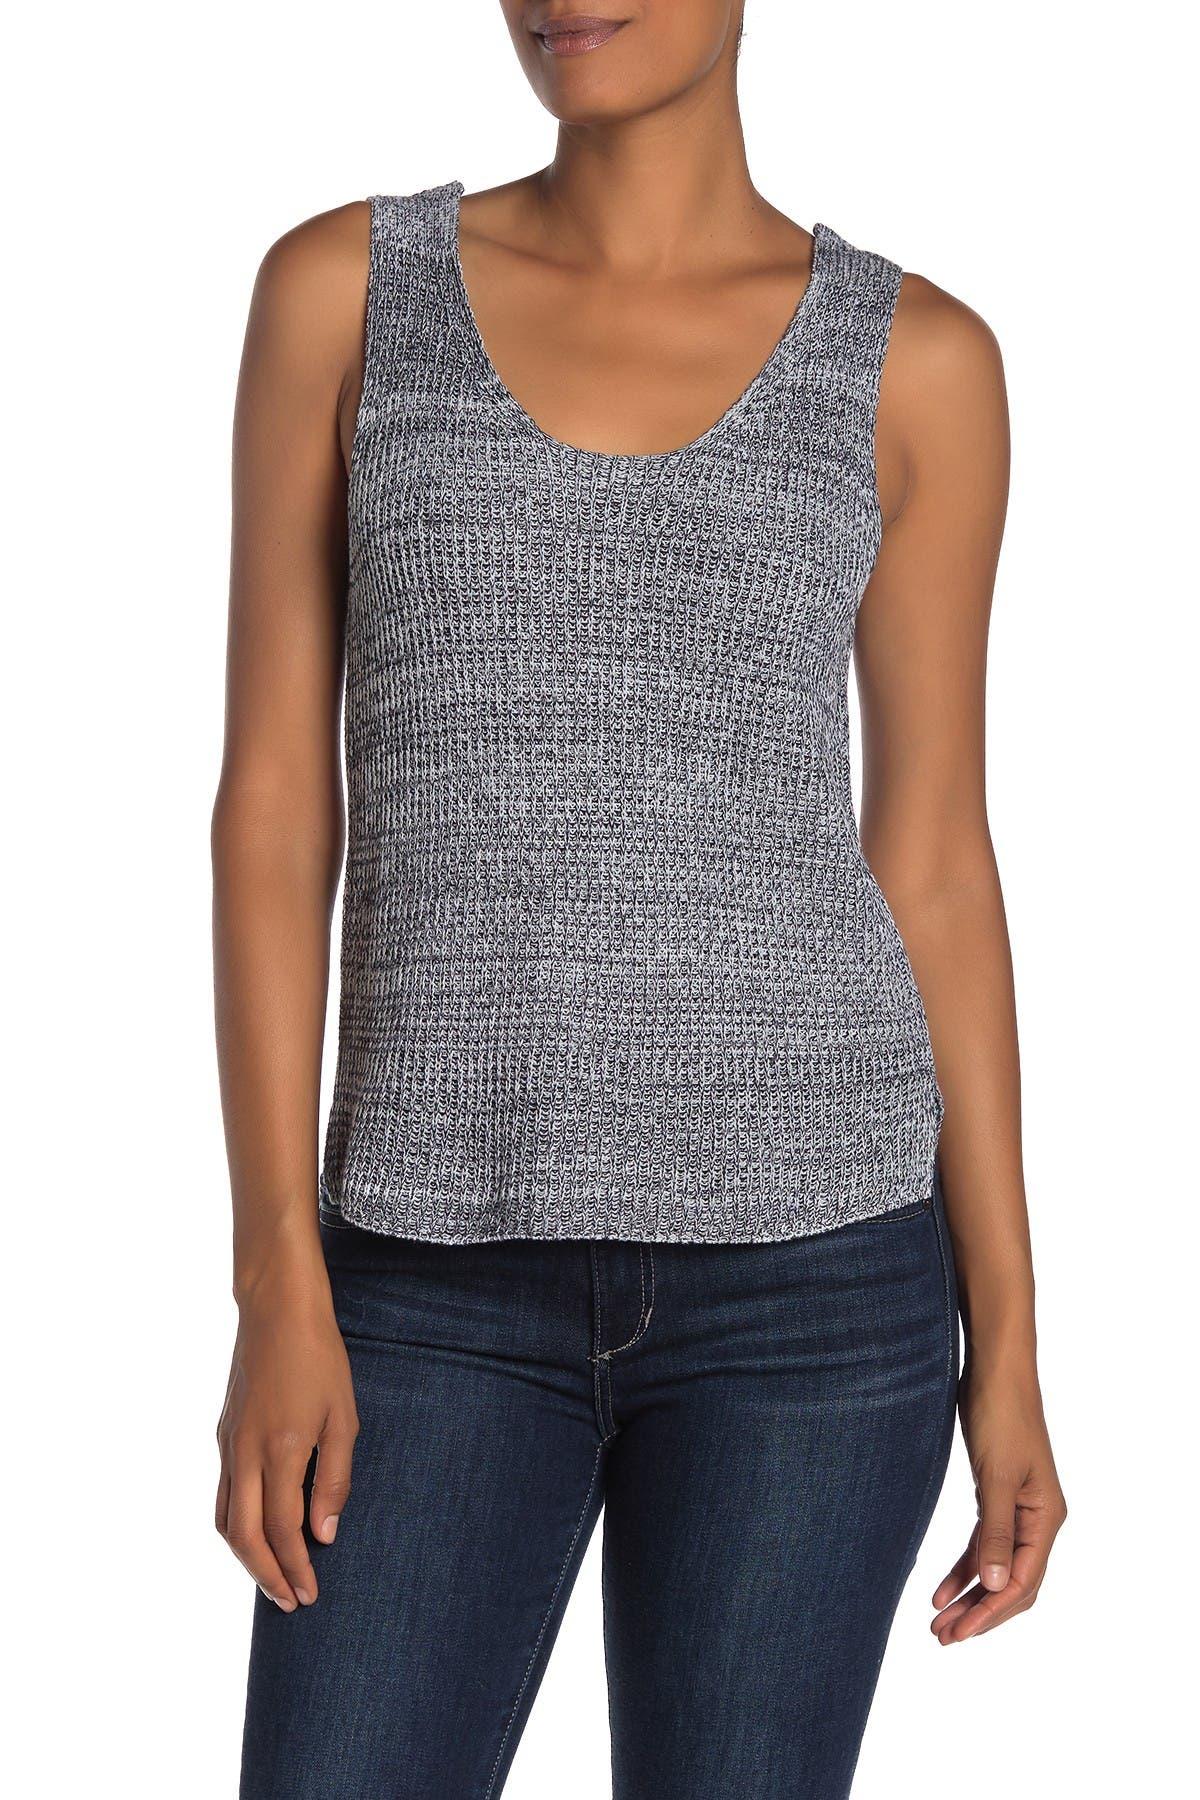 Image of SUSINA Marled Sweater Tank Top